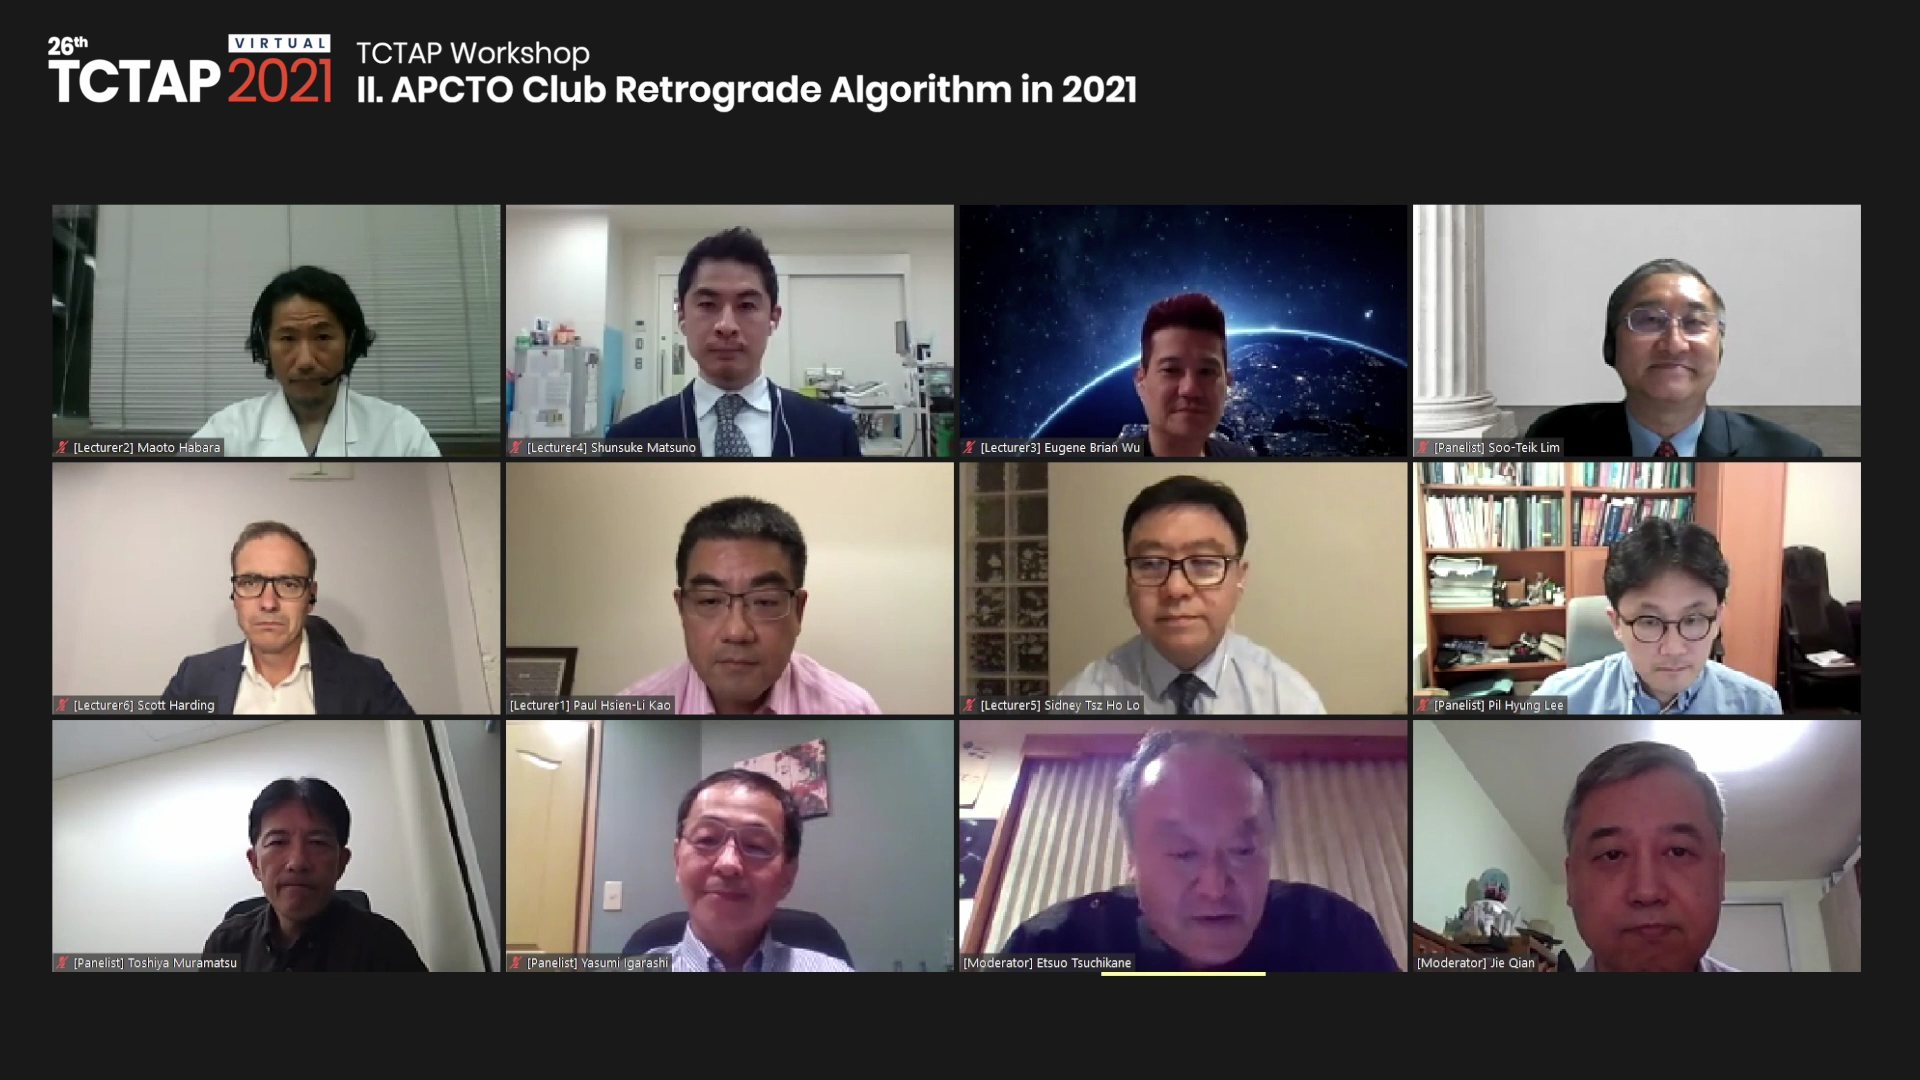 [TCTAP 2021 Virtual] TCTAP Workshop - II. APCTO Club Retrograde Algorithm in 2021